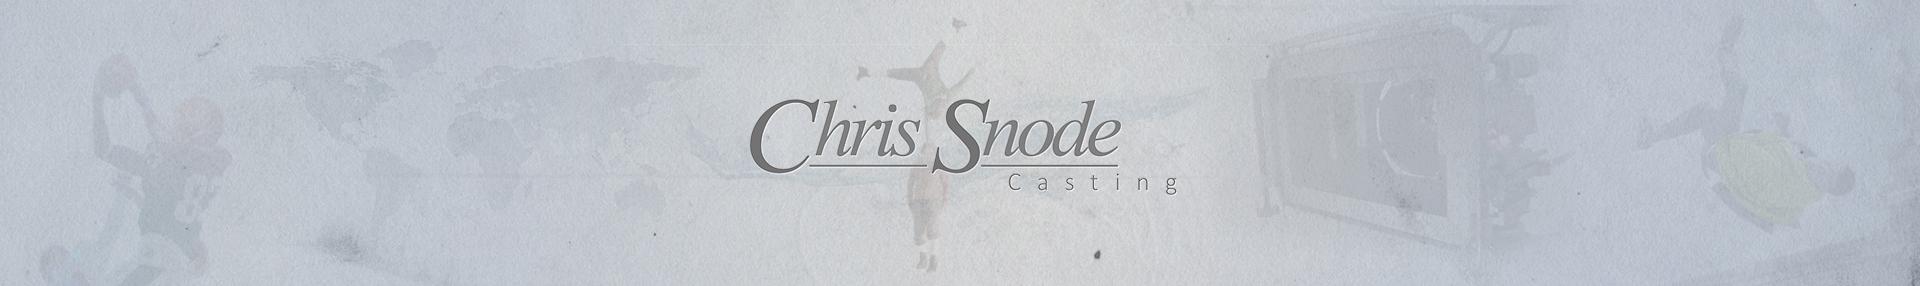 Sports Casting Specialist - Chris Snode